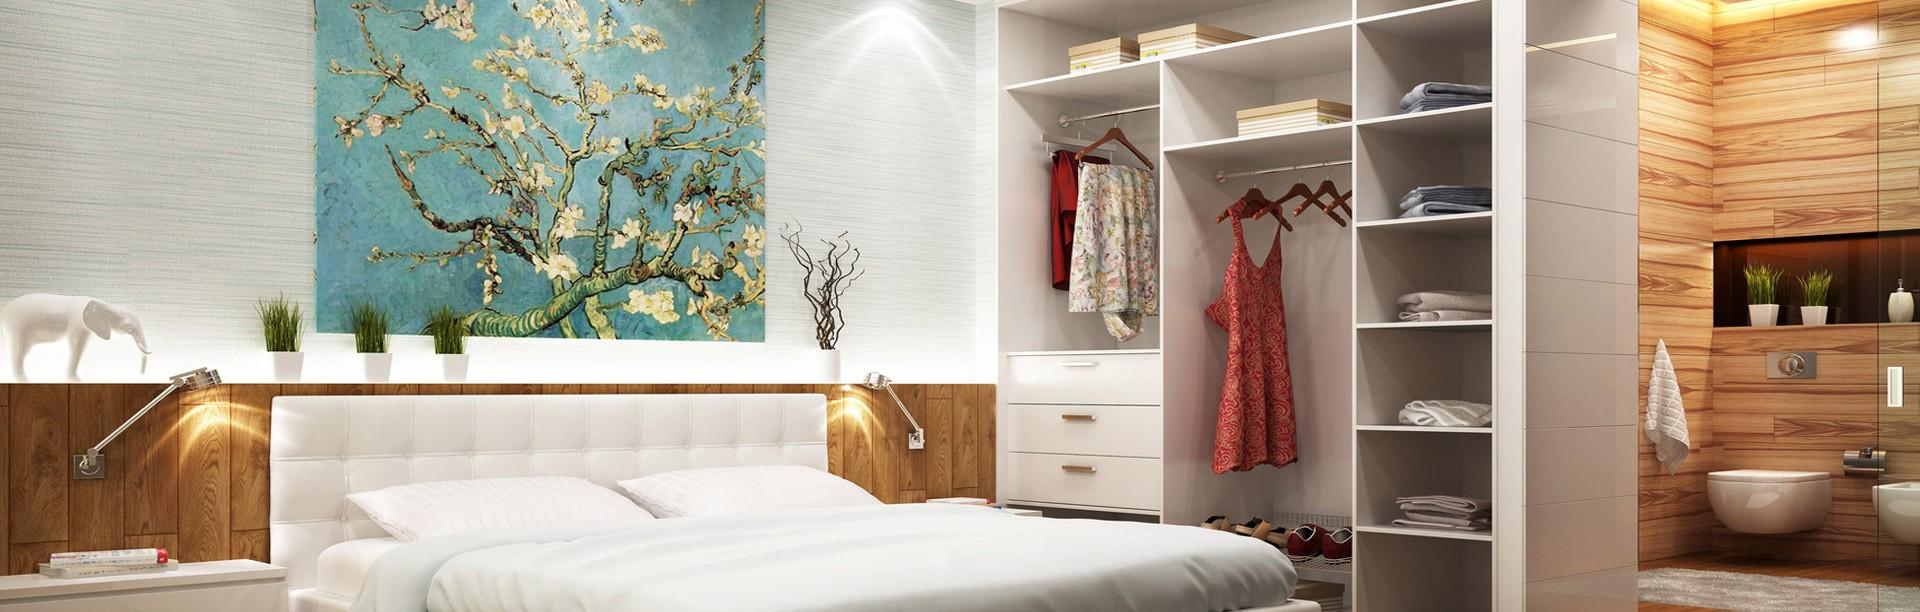 regalsystem nach ma f r schlafzimmer online planen. Black Bedroom Furniture Sets. Home Design Ideas